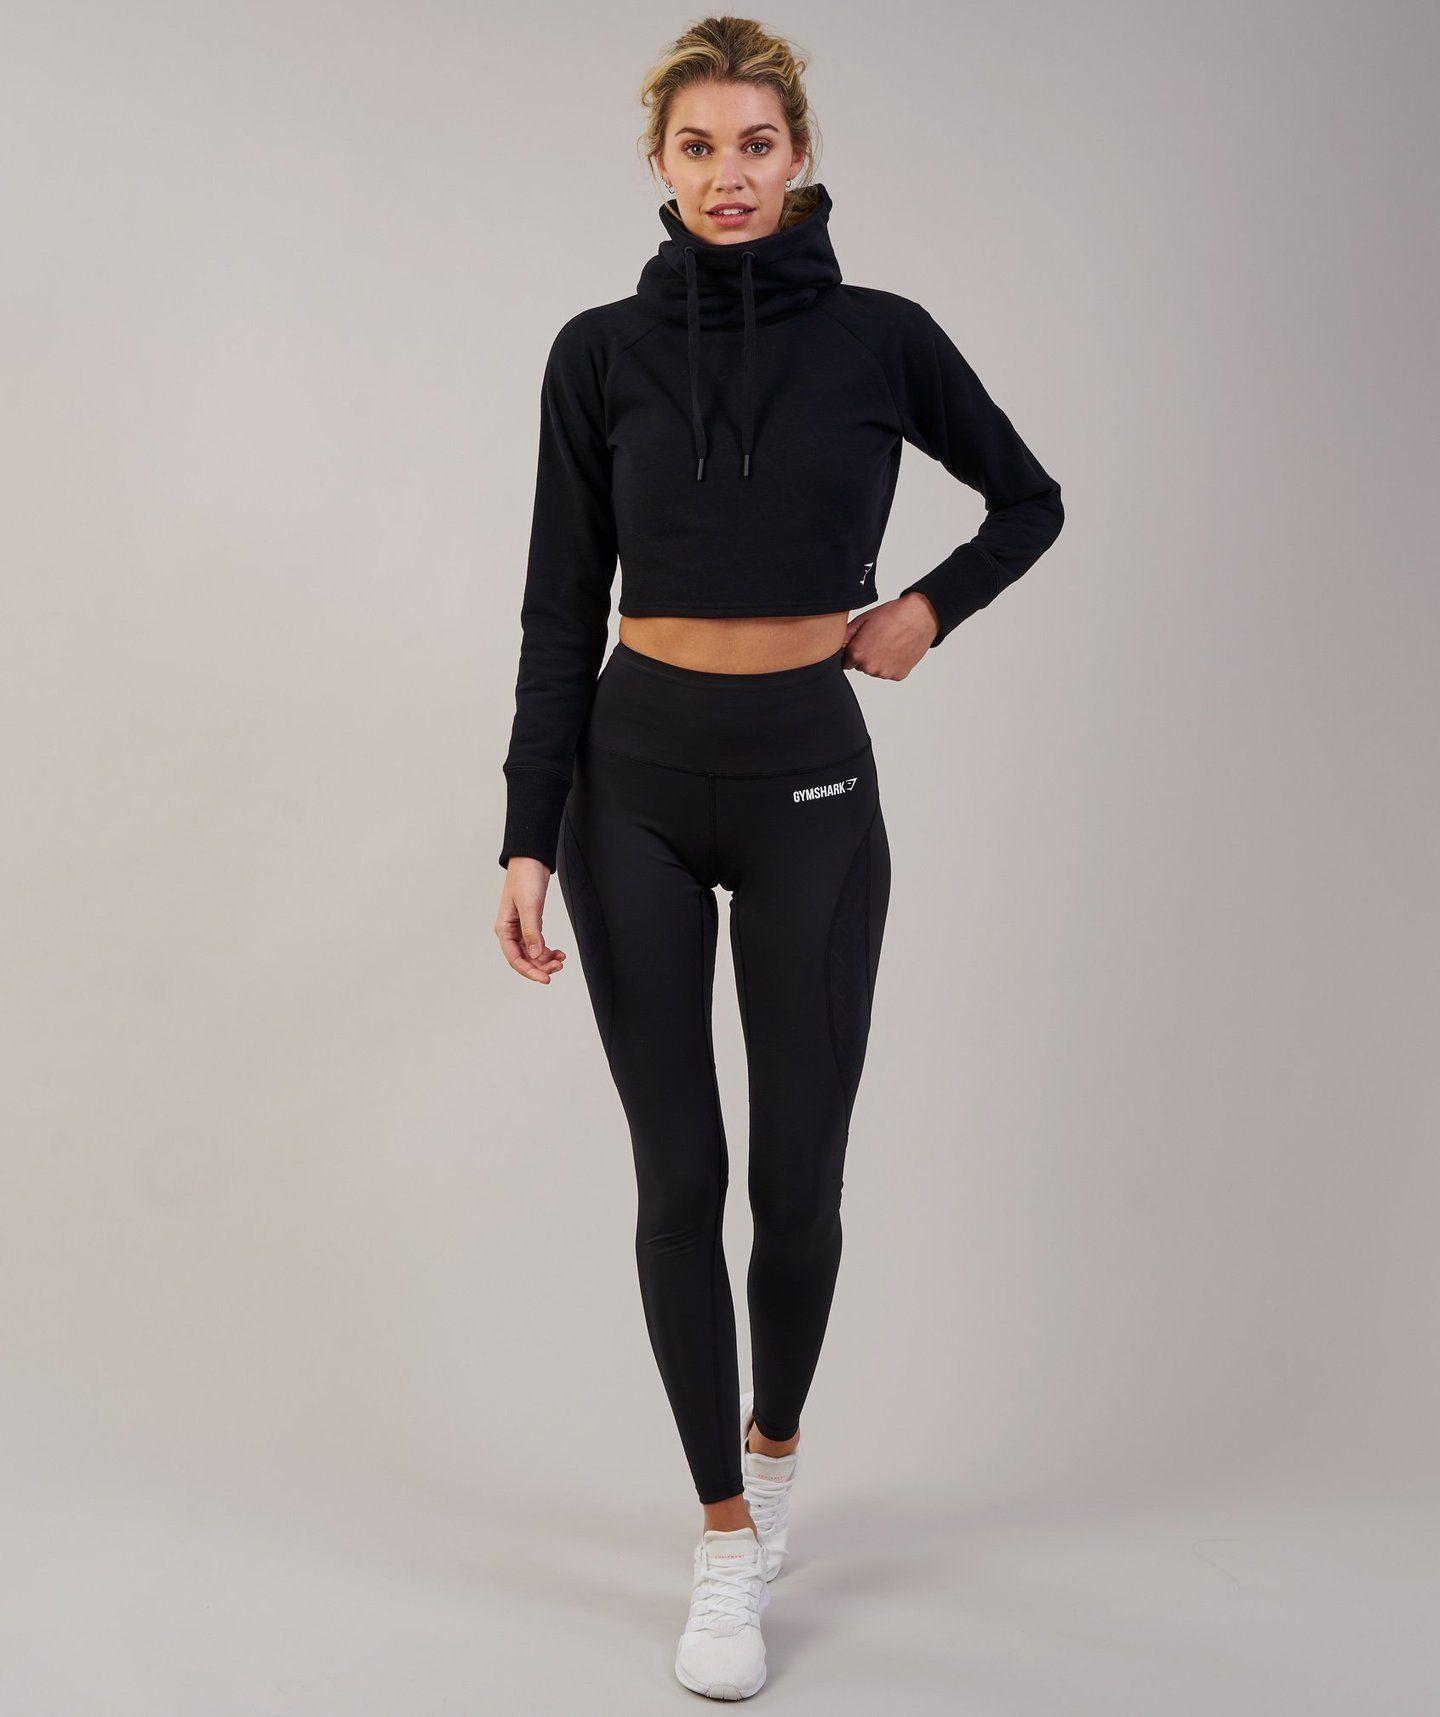 0dd98dccb05117 Gymshark Slouch Cropped Hoodie - Black 2 | My pins | Cropped hoodie ...